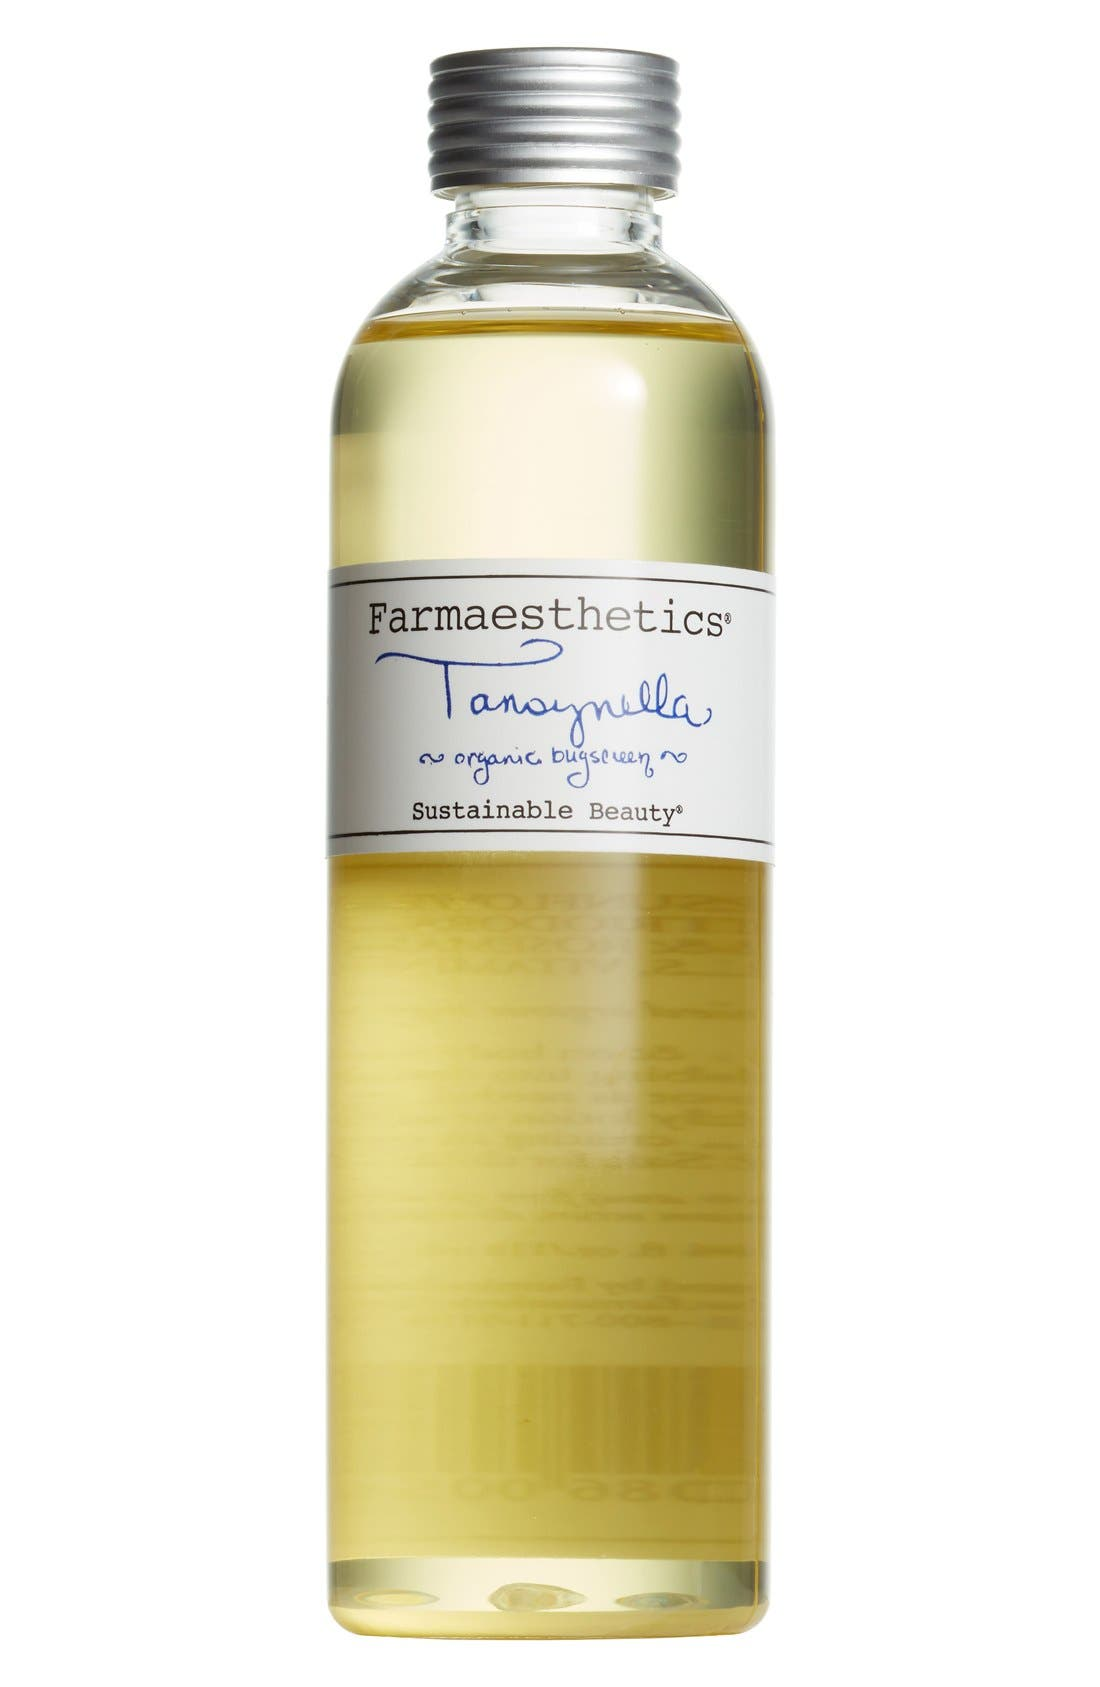 Farmaesthetics Tansynella Organic Bugscreen